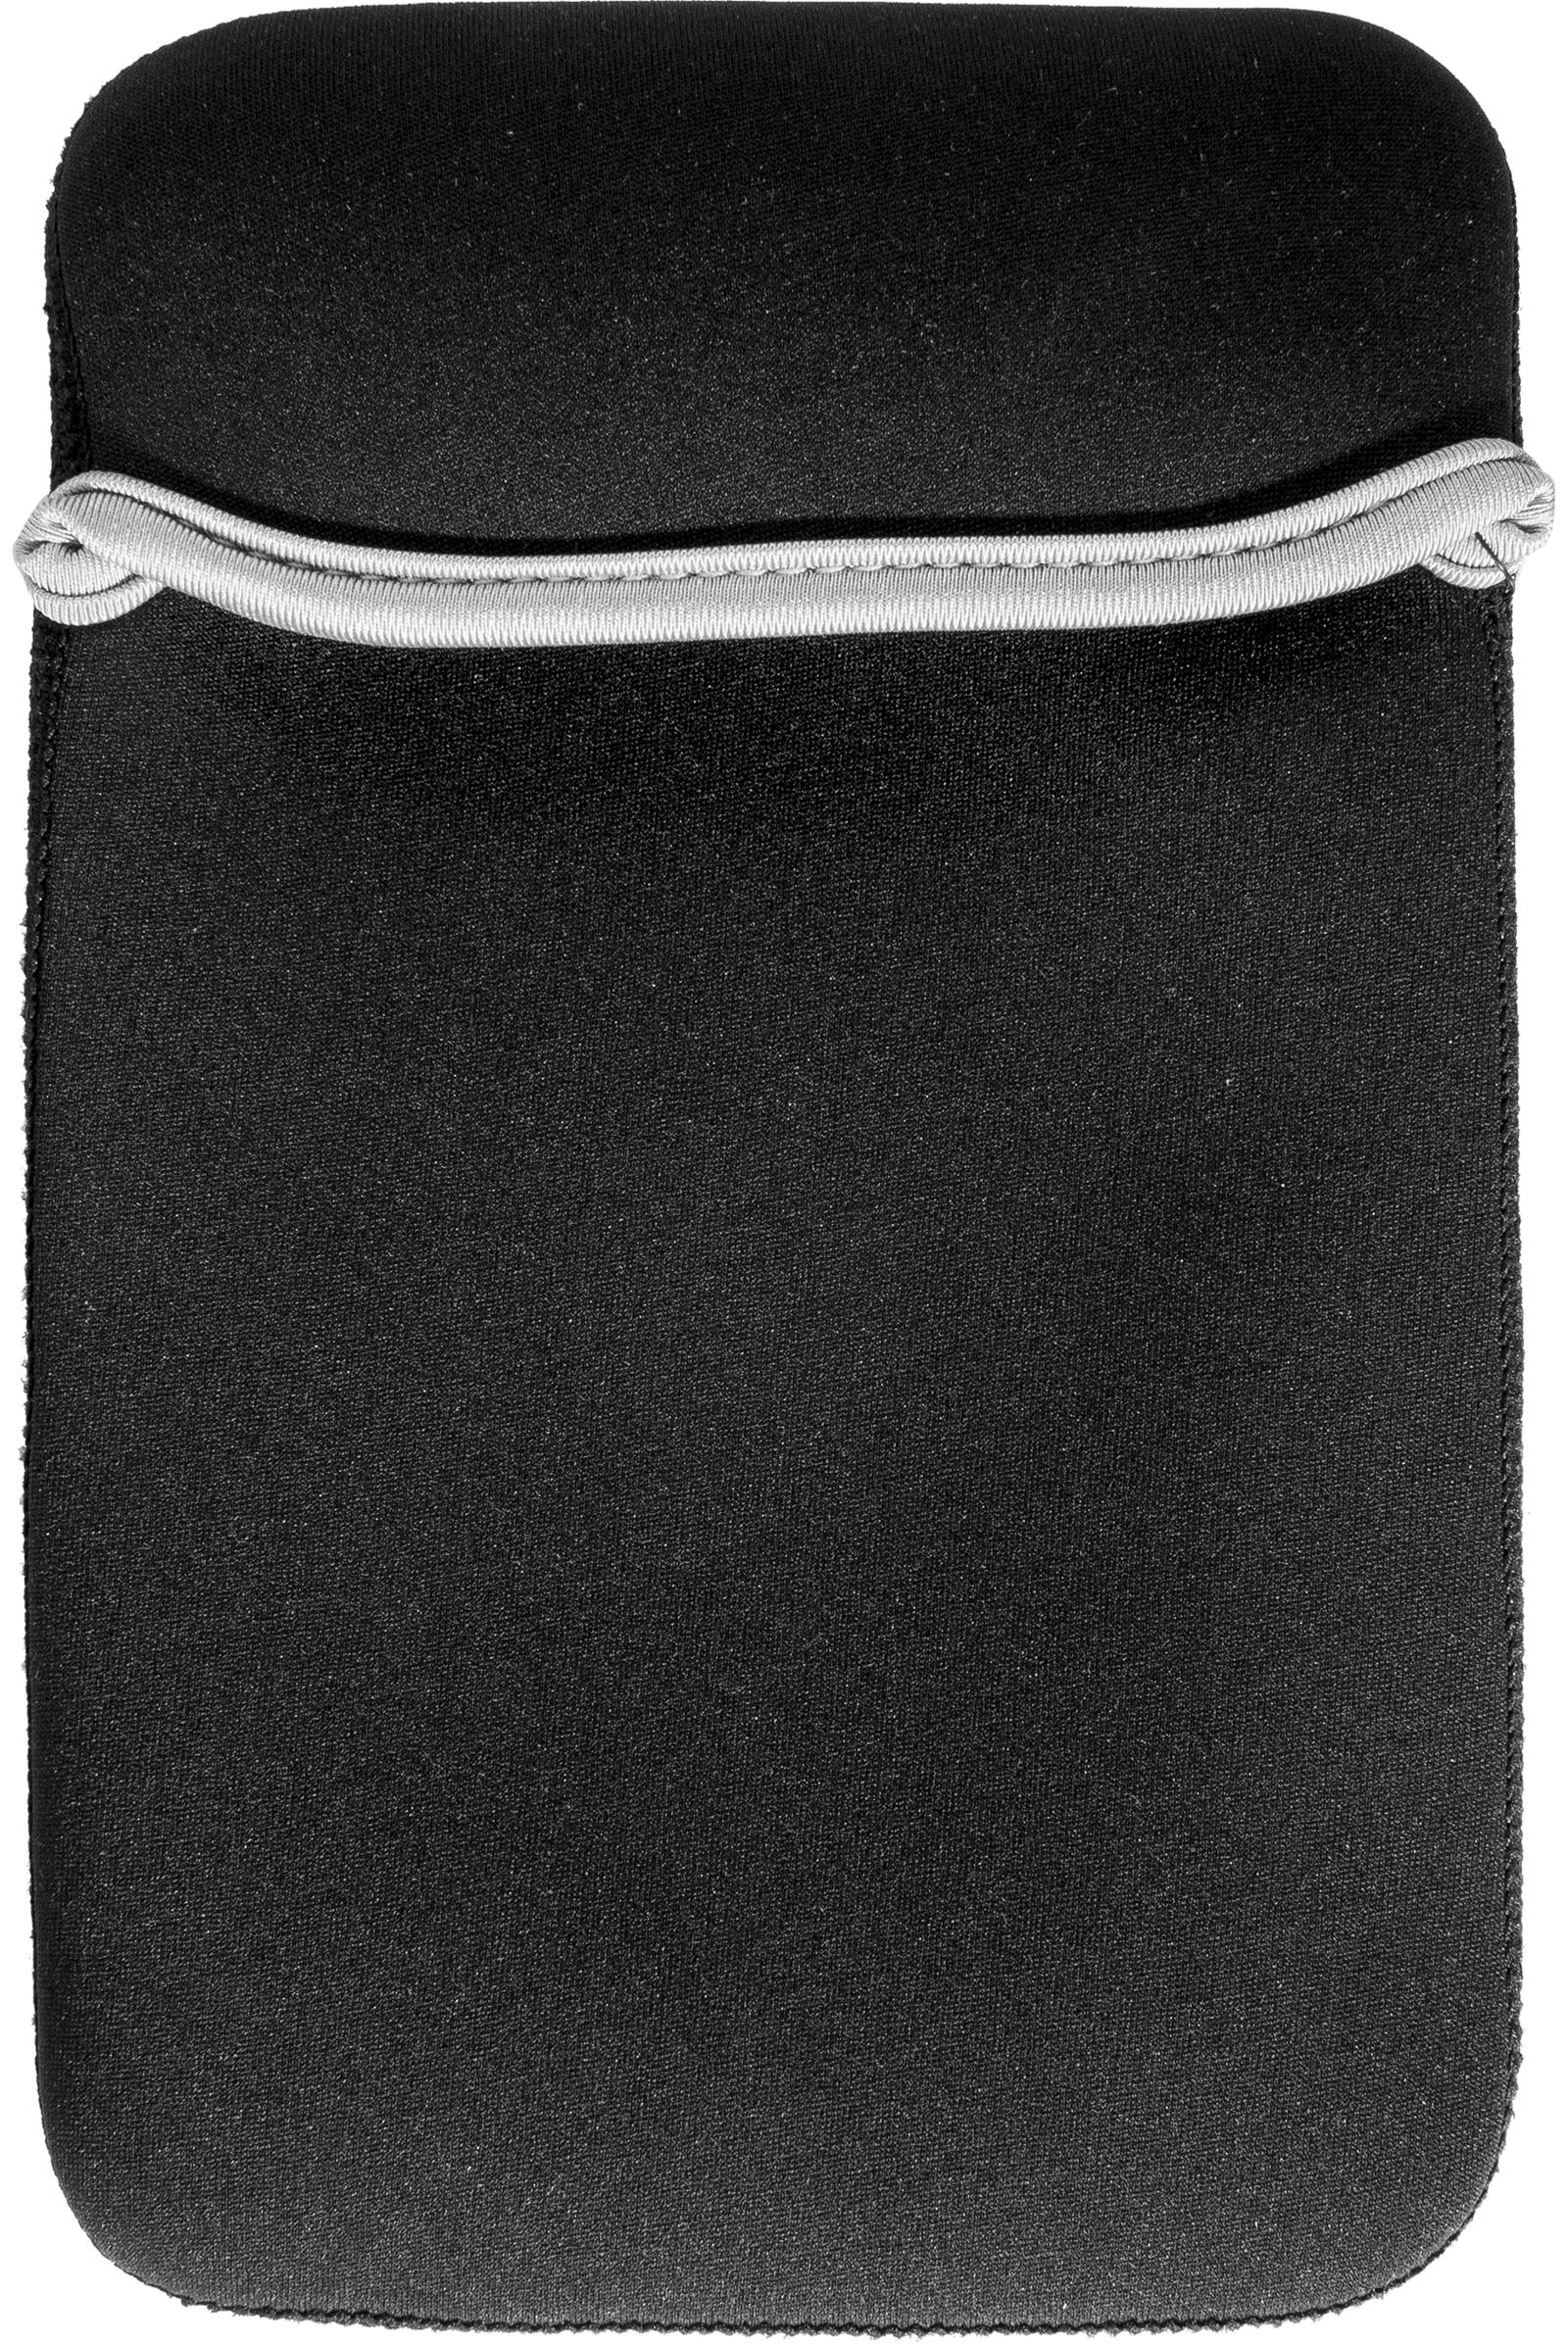 Чехол для планшета Defender Tablet fur uni, 26014 цена